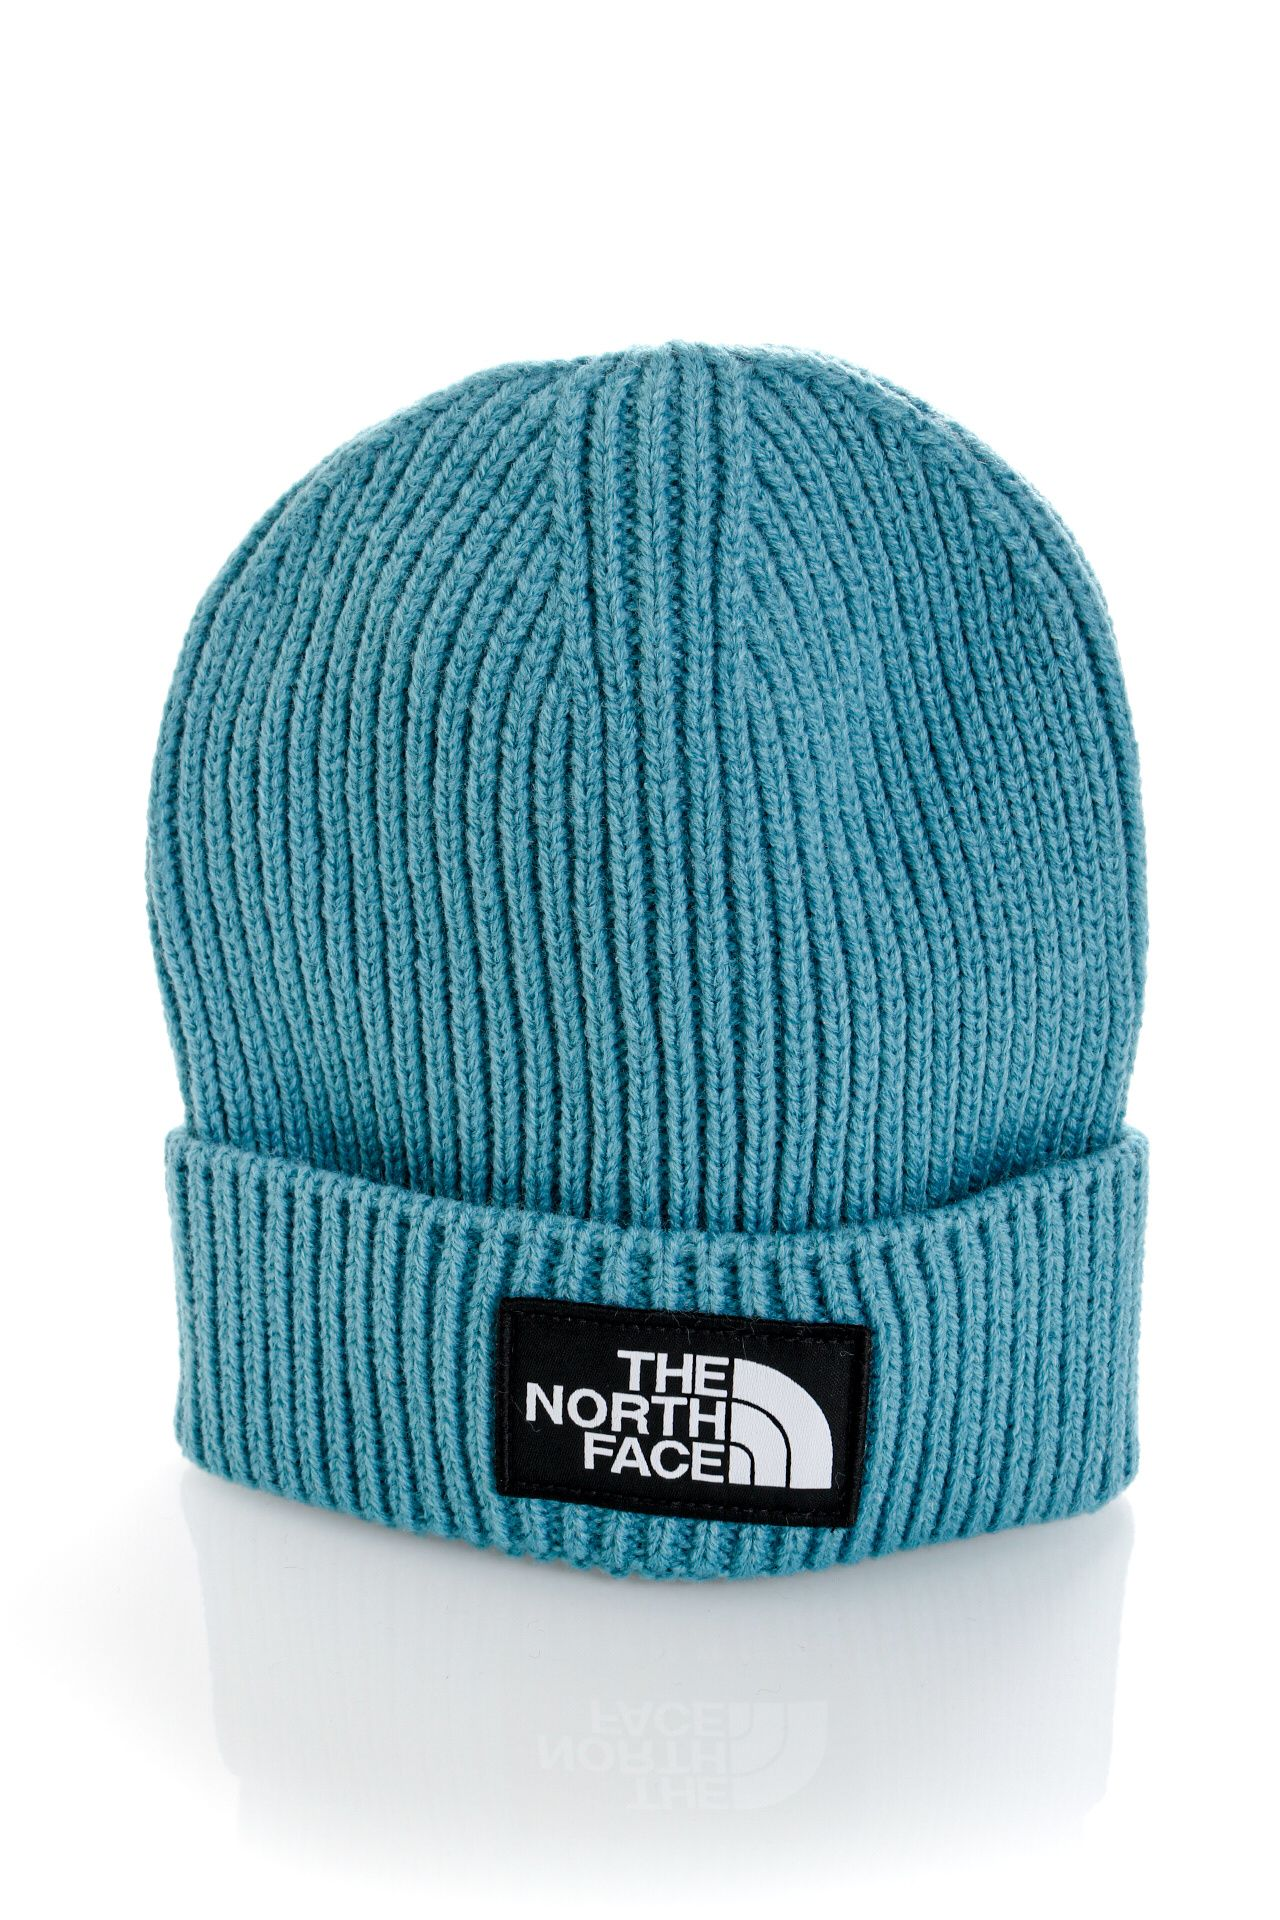 Afbeelding van The North Face Muts TNF LOGO BOX CUFFED REG STORM BLUE NF0A3FJX4Y31